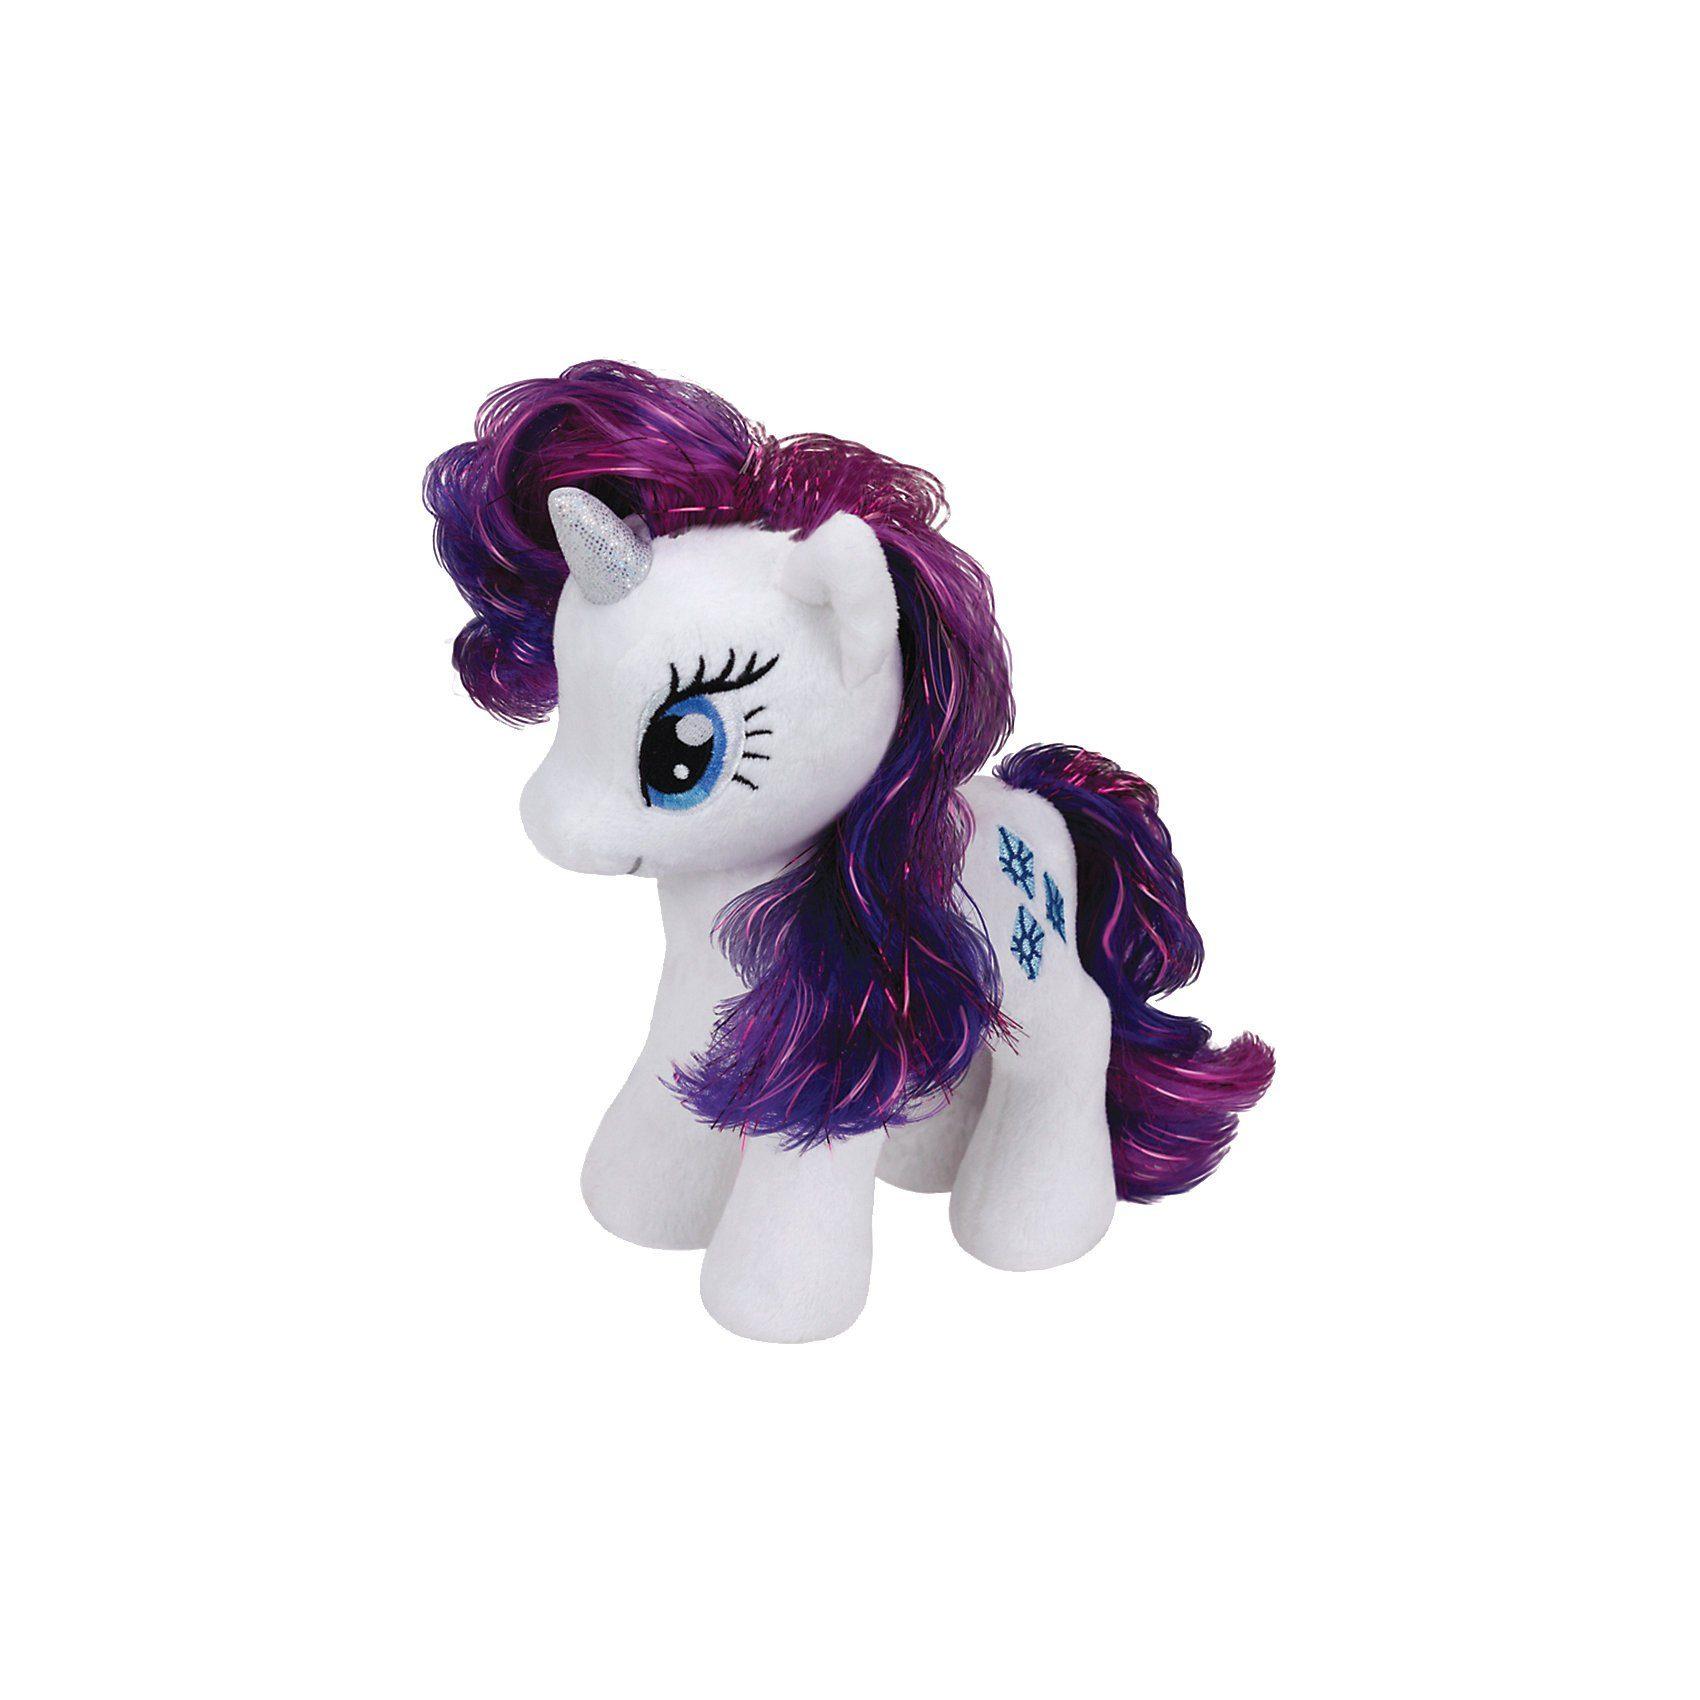 Ty My Little Pony Large - Rari, 24 cm